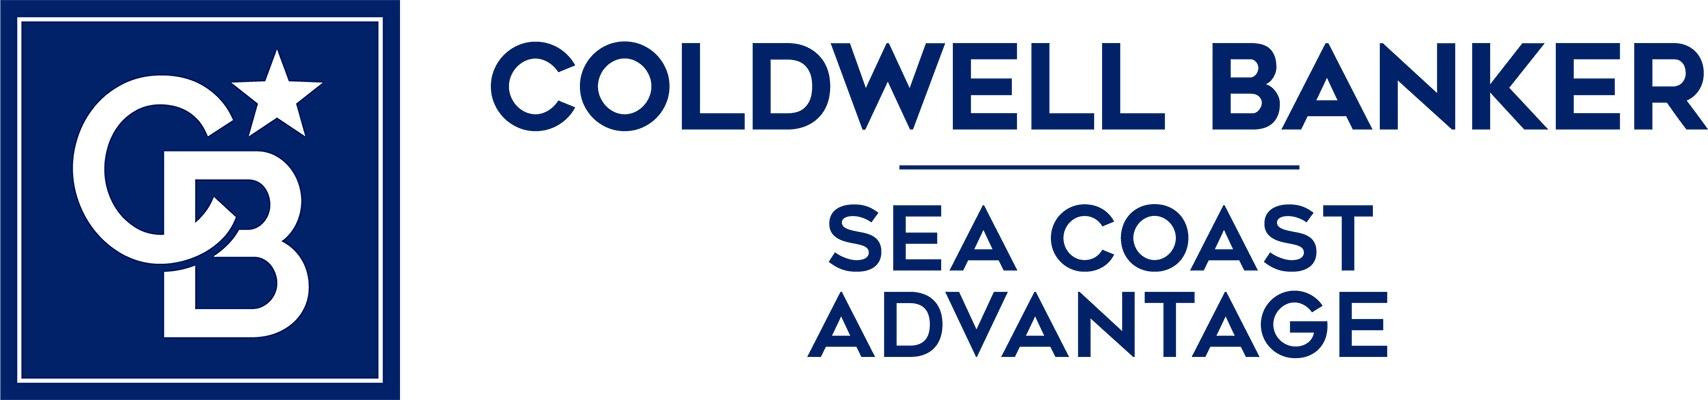 Katie Moore - Coldwell Banker Sea Coast Advantage Realty Logo